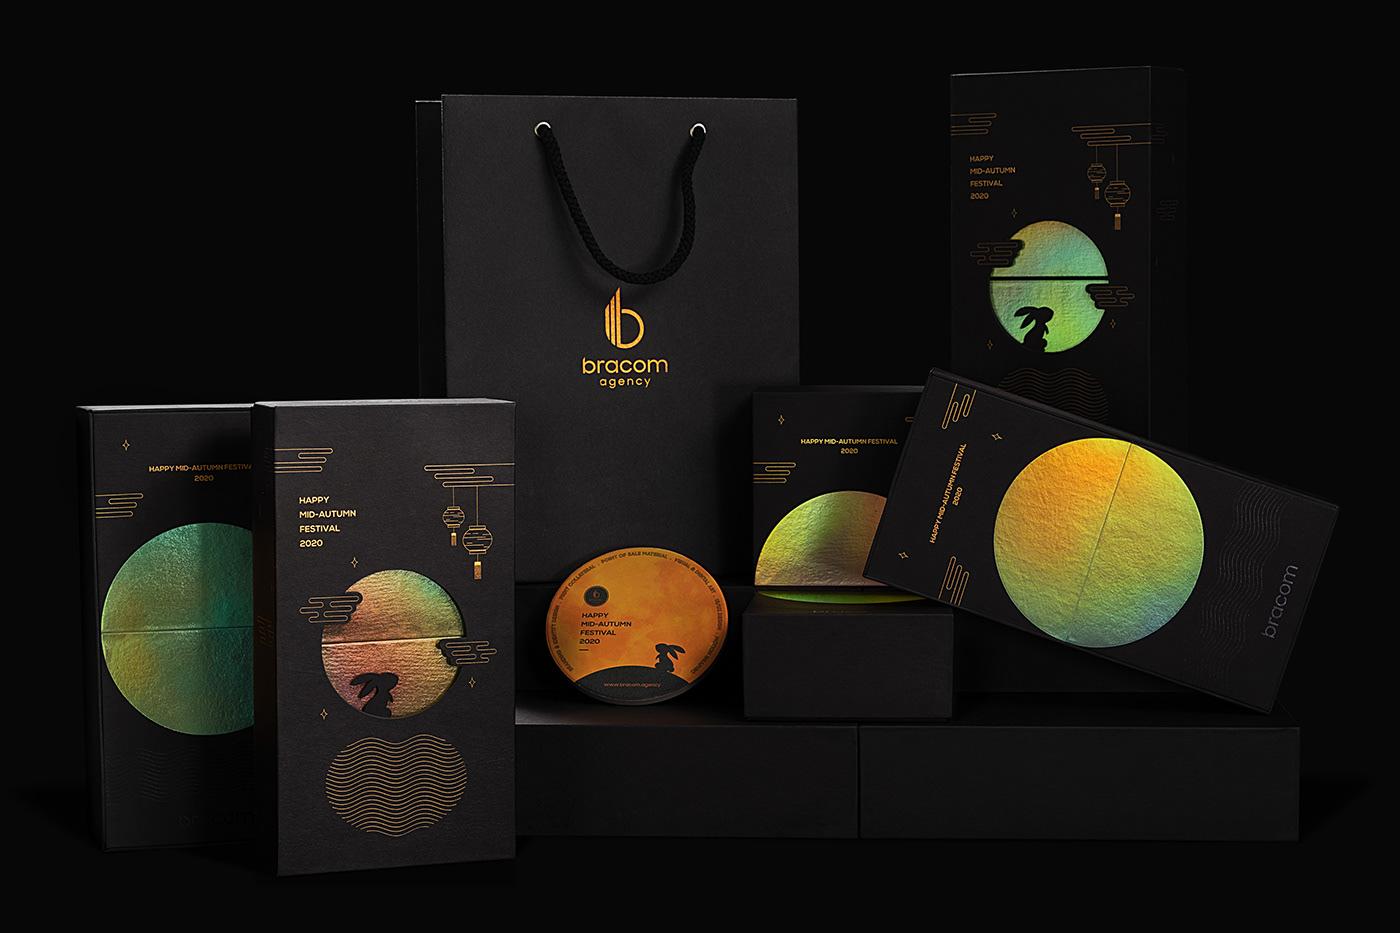 bracom bracom agency Creative Design gift box graphic design  mid-autumn moon mooncake Packaging